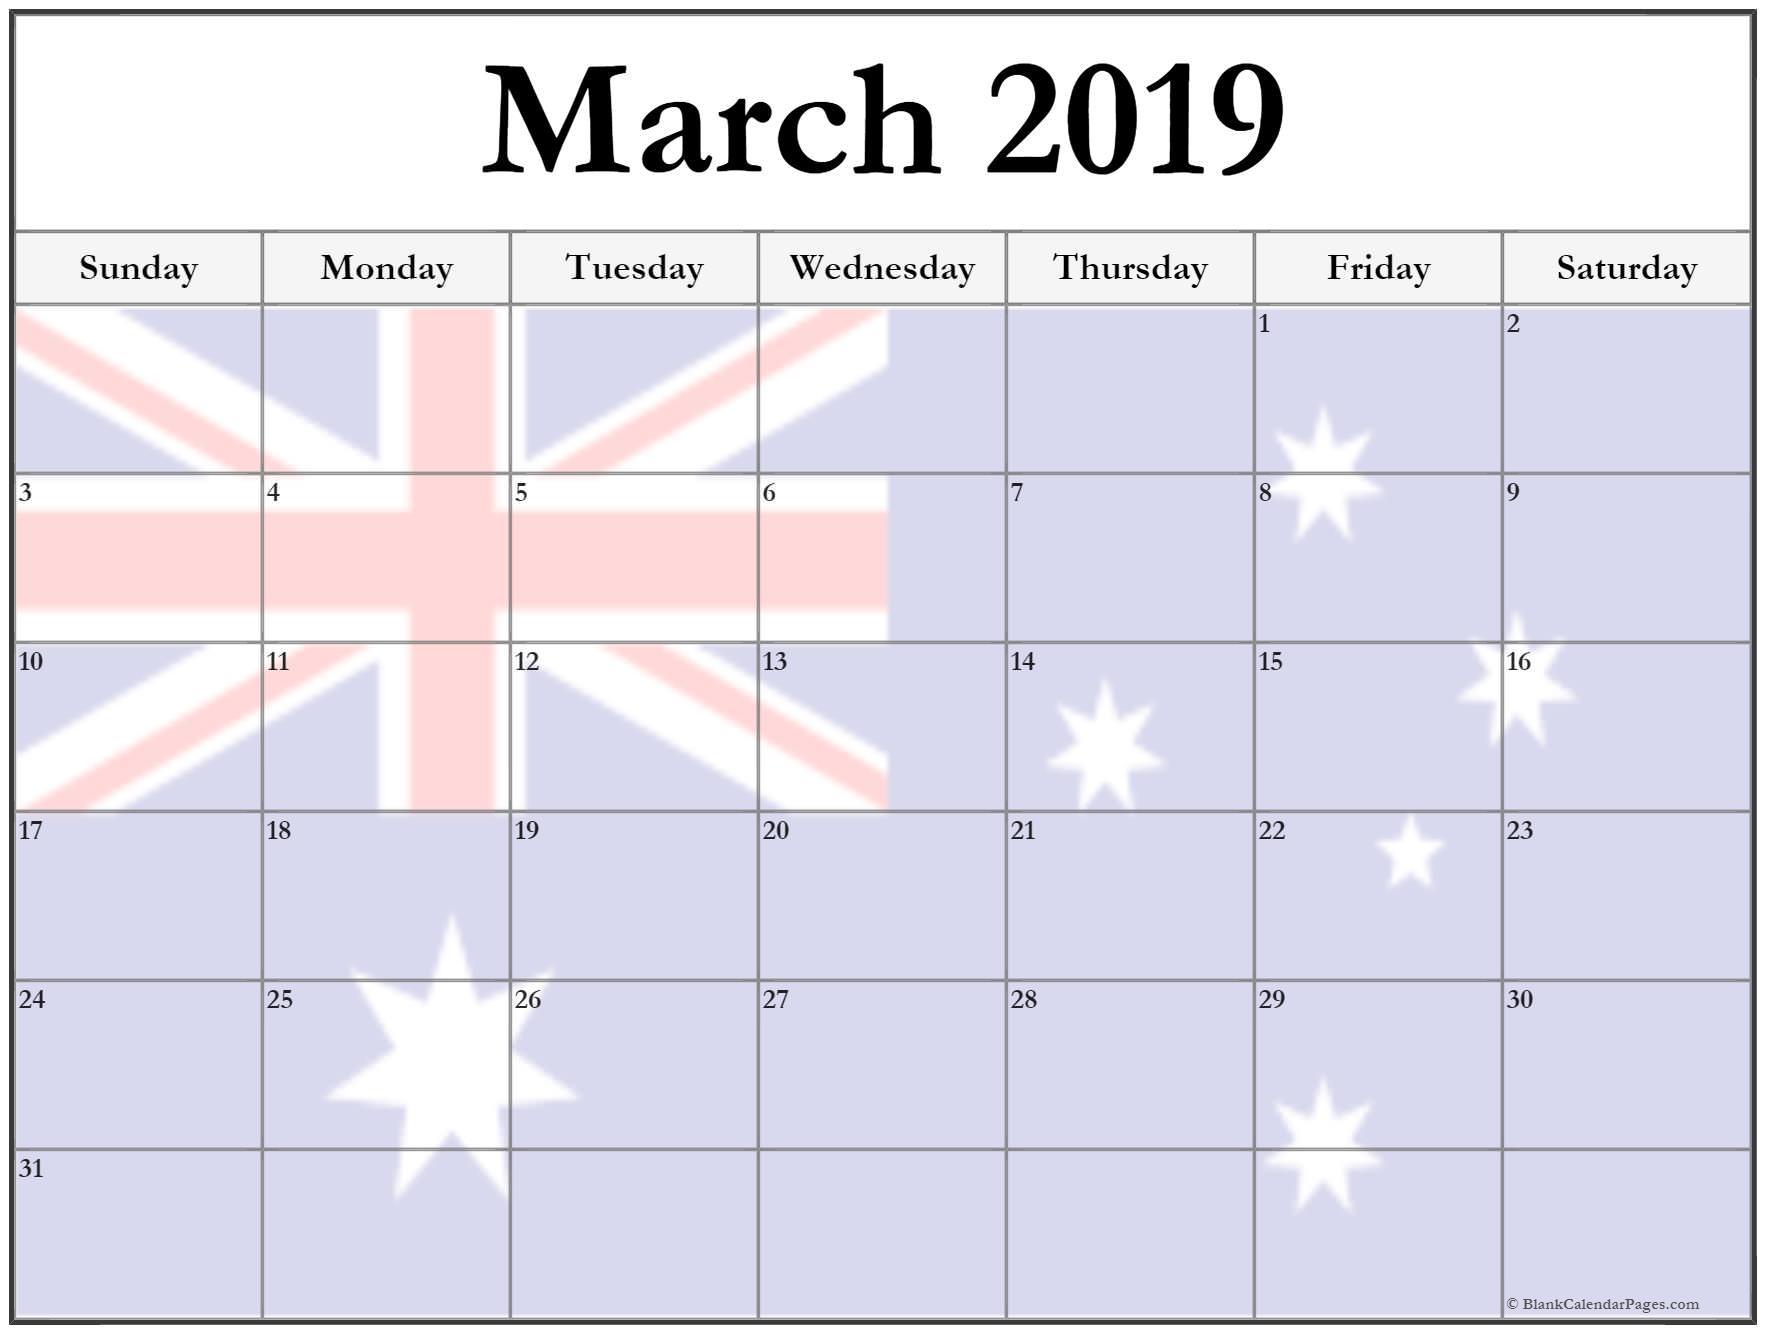 March 2019 Calendar Australia  Australia Moment regarding Calendars Michel Zbinden